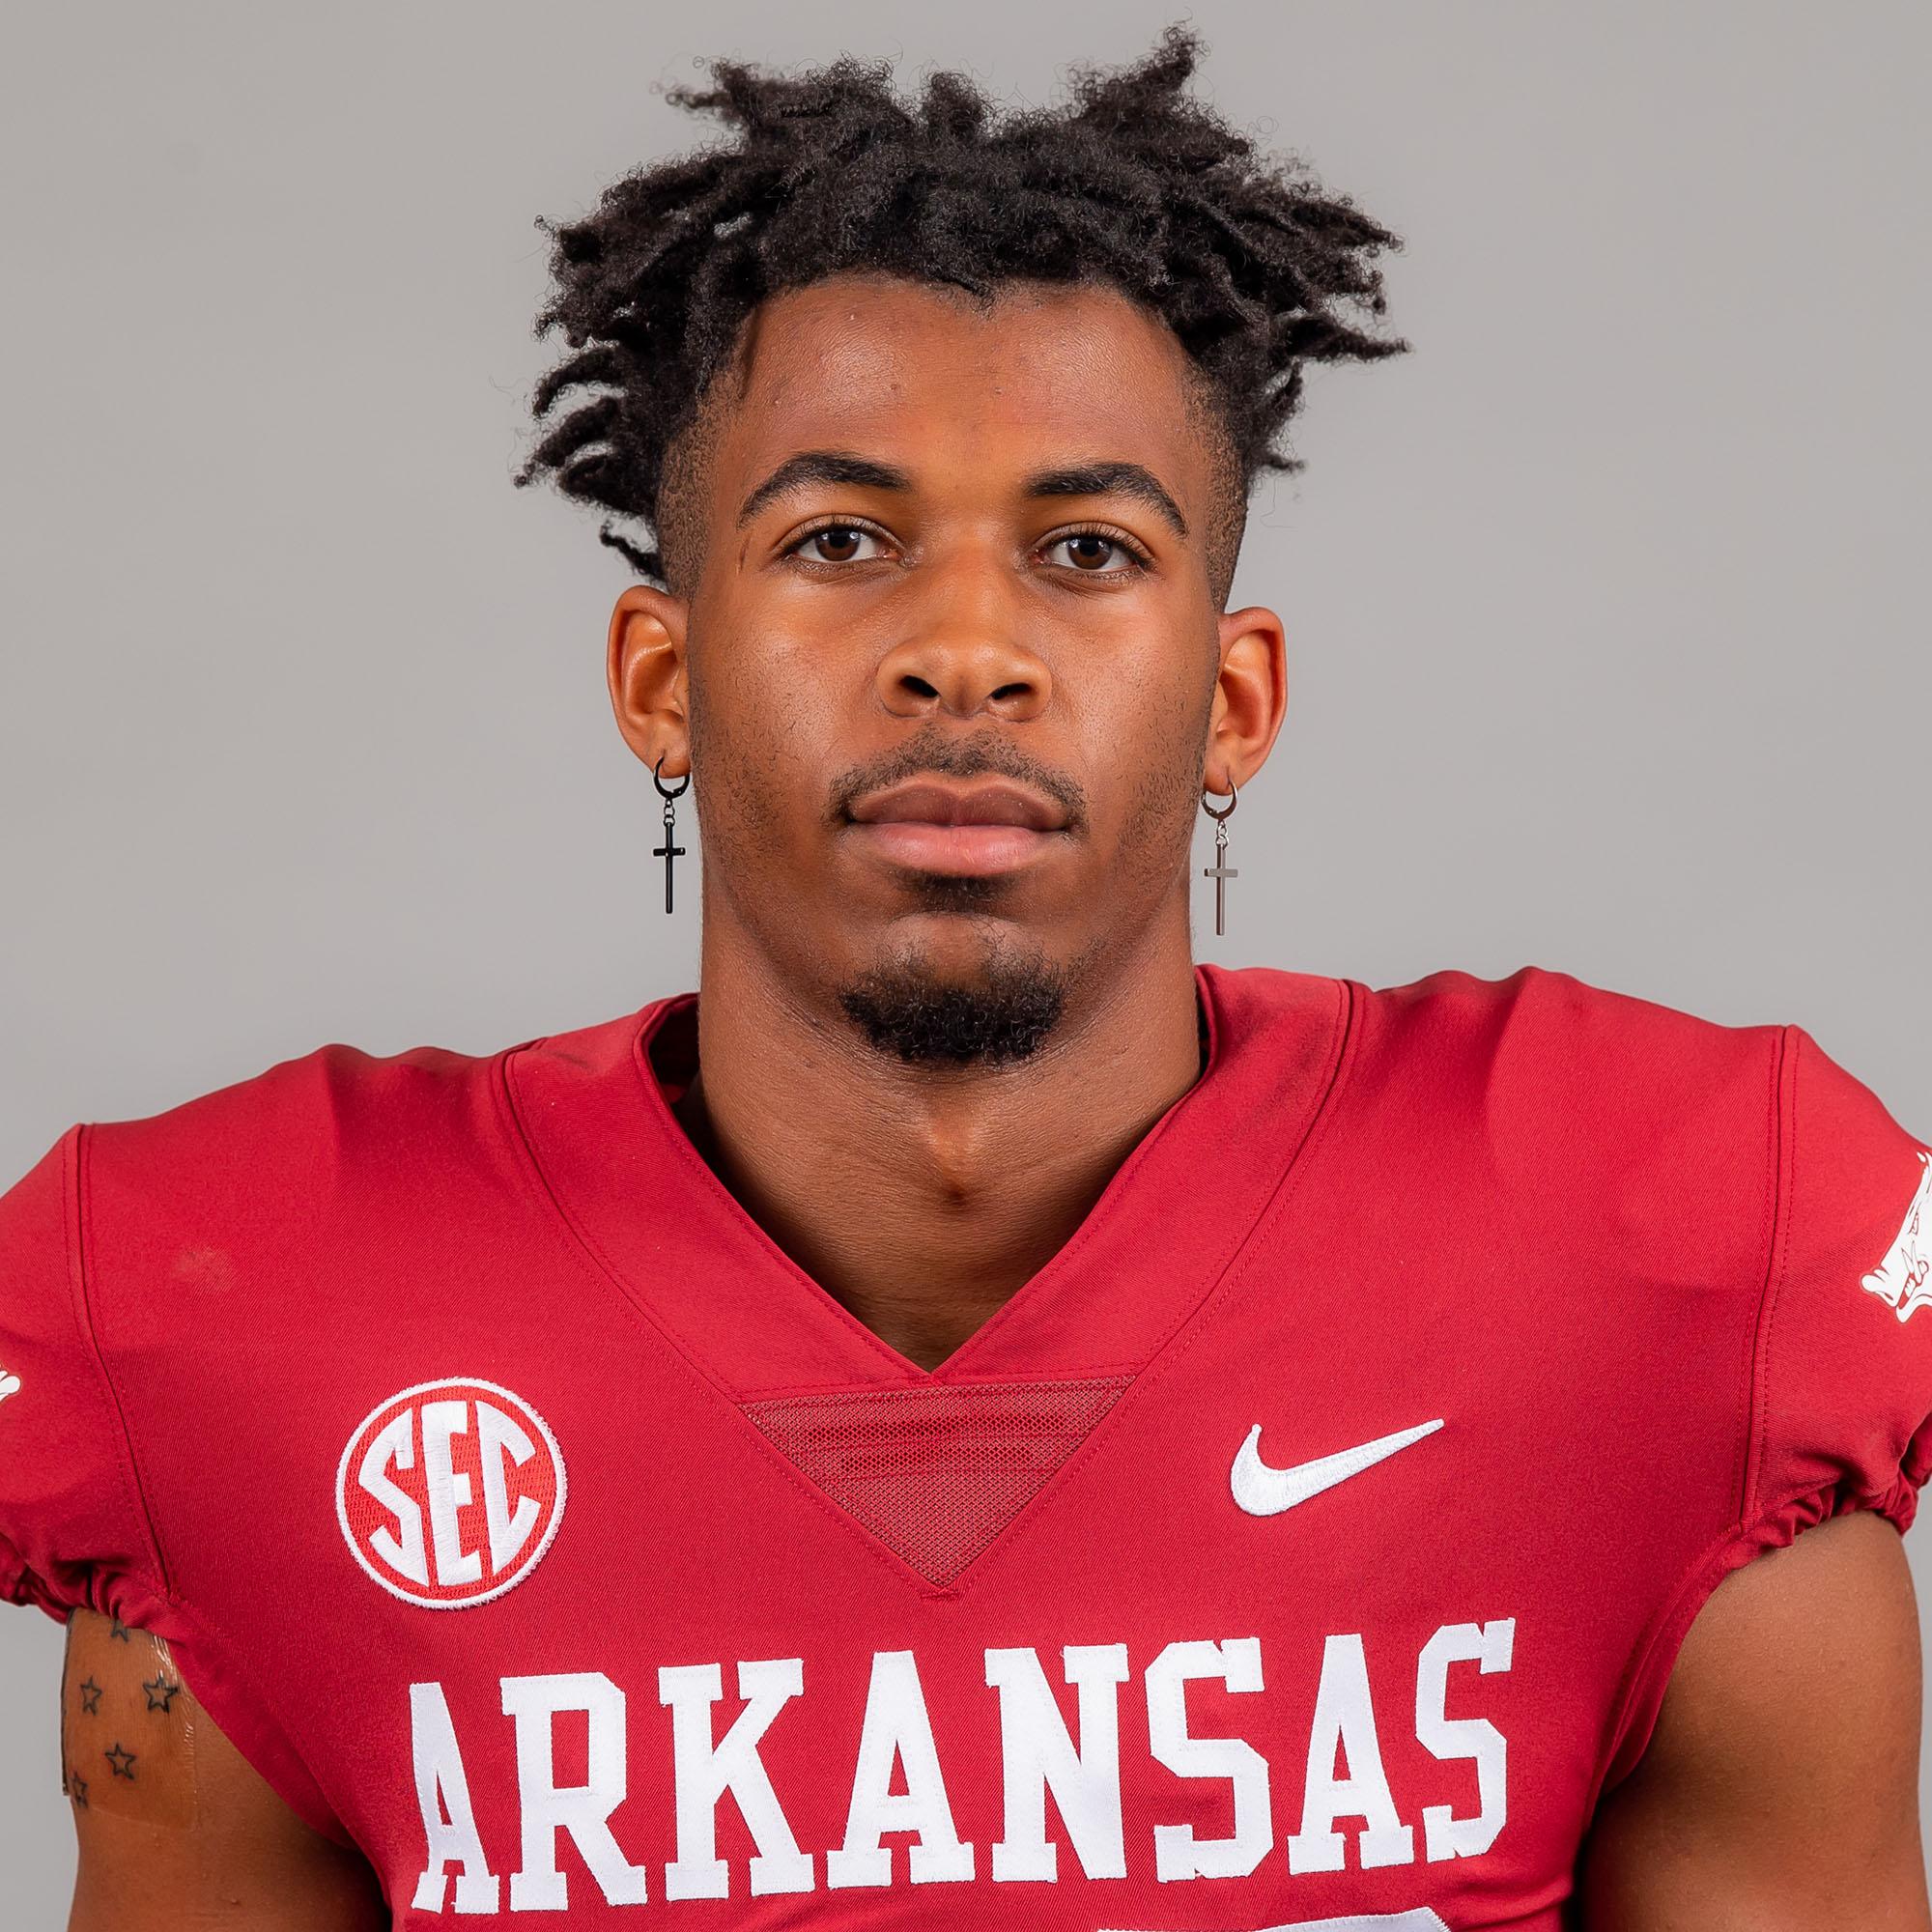 Jon Conley - Football - Arkansas Razorbacks